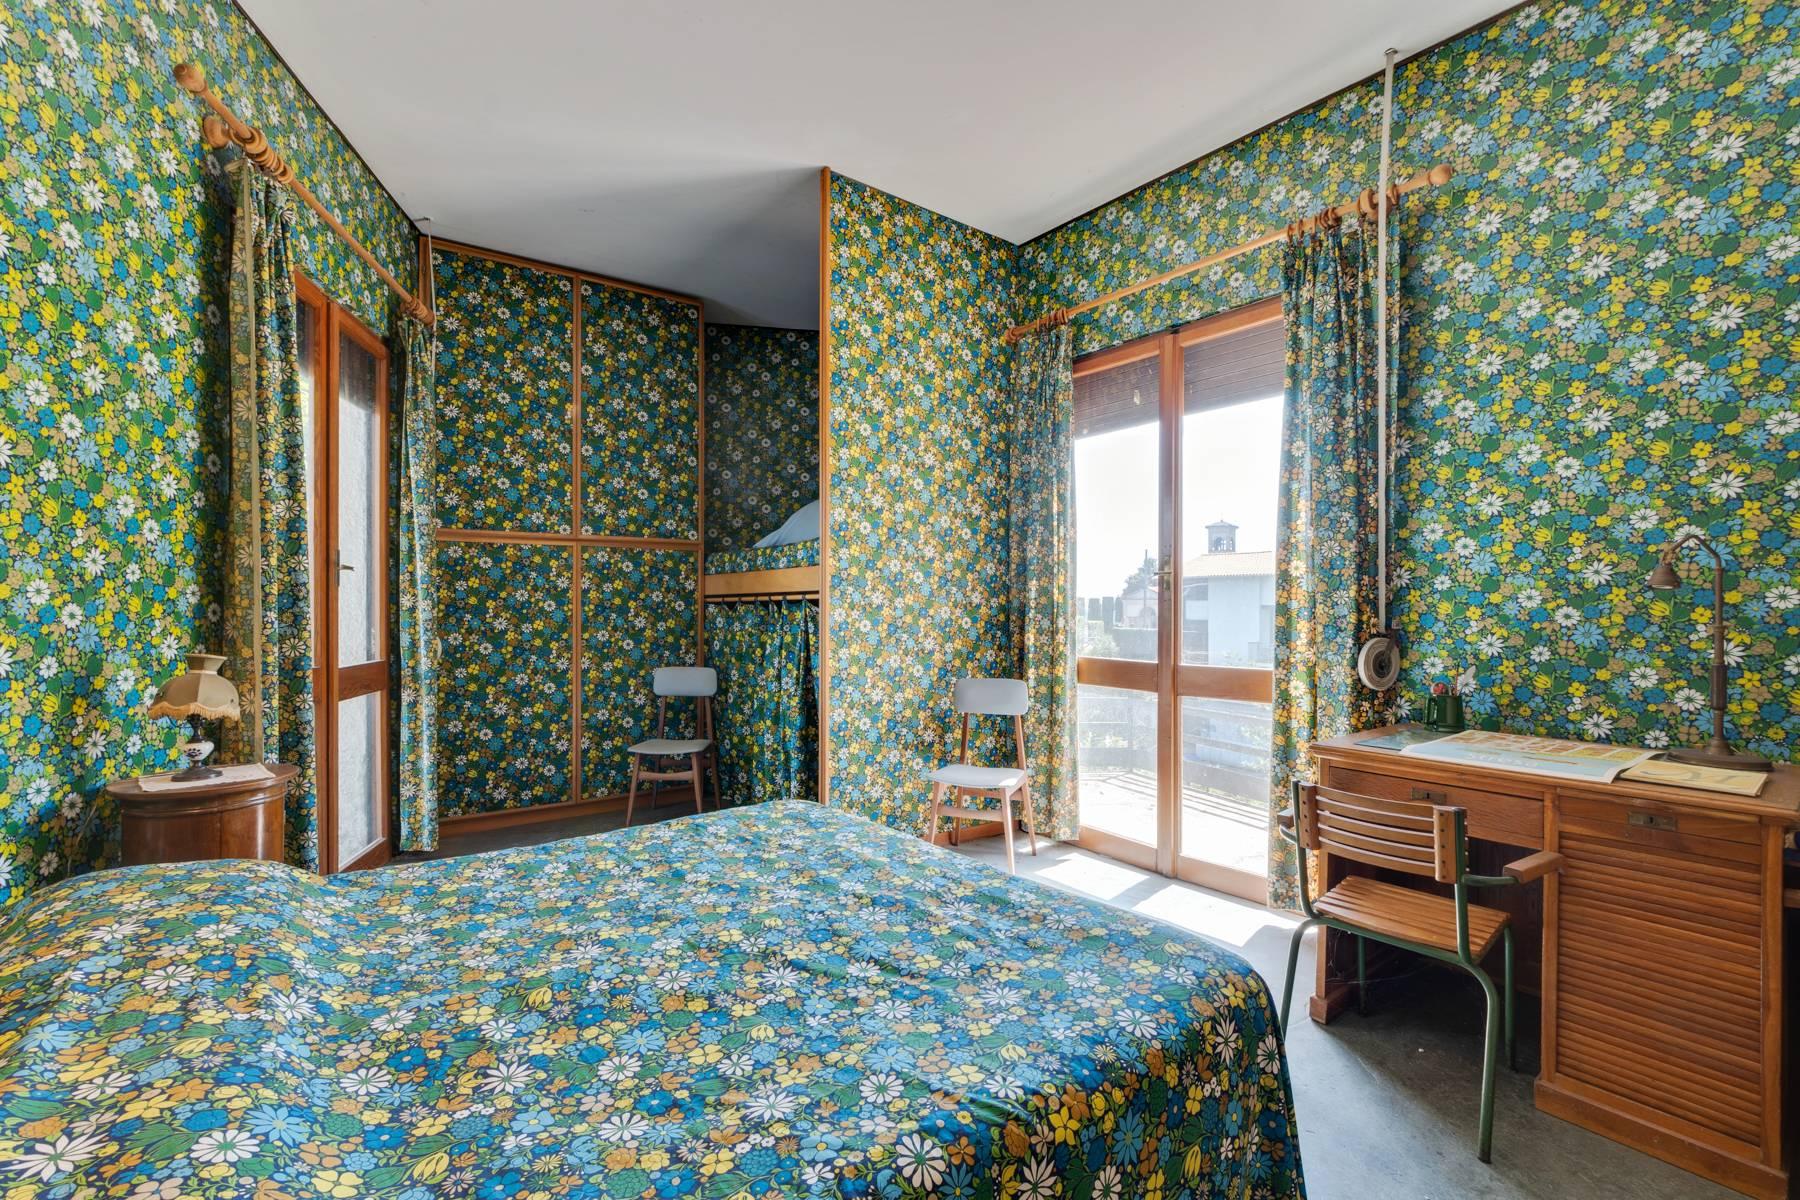 Villa in Vendita a Stresa: 5 locali, 150 mq - Foto 19